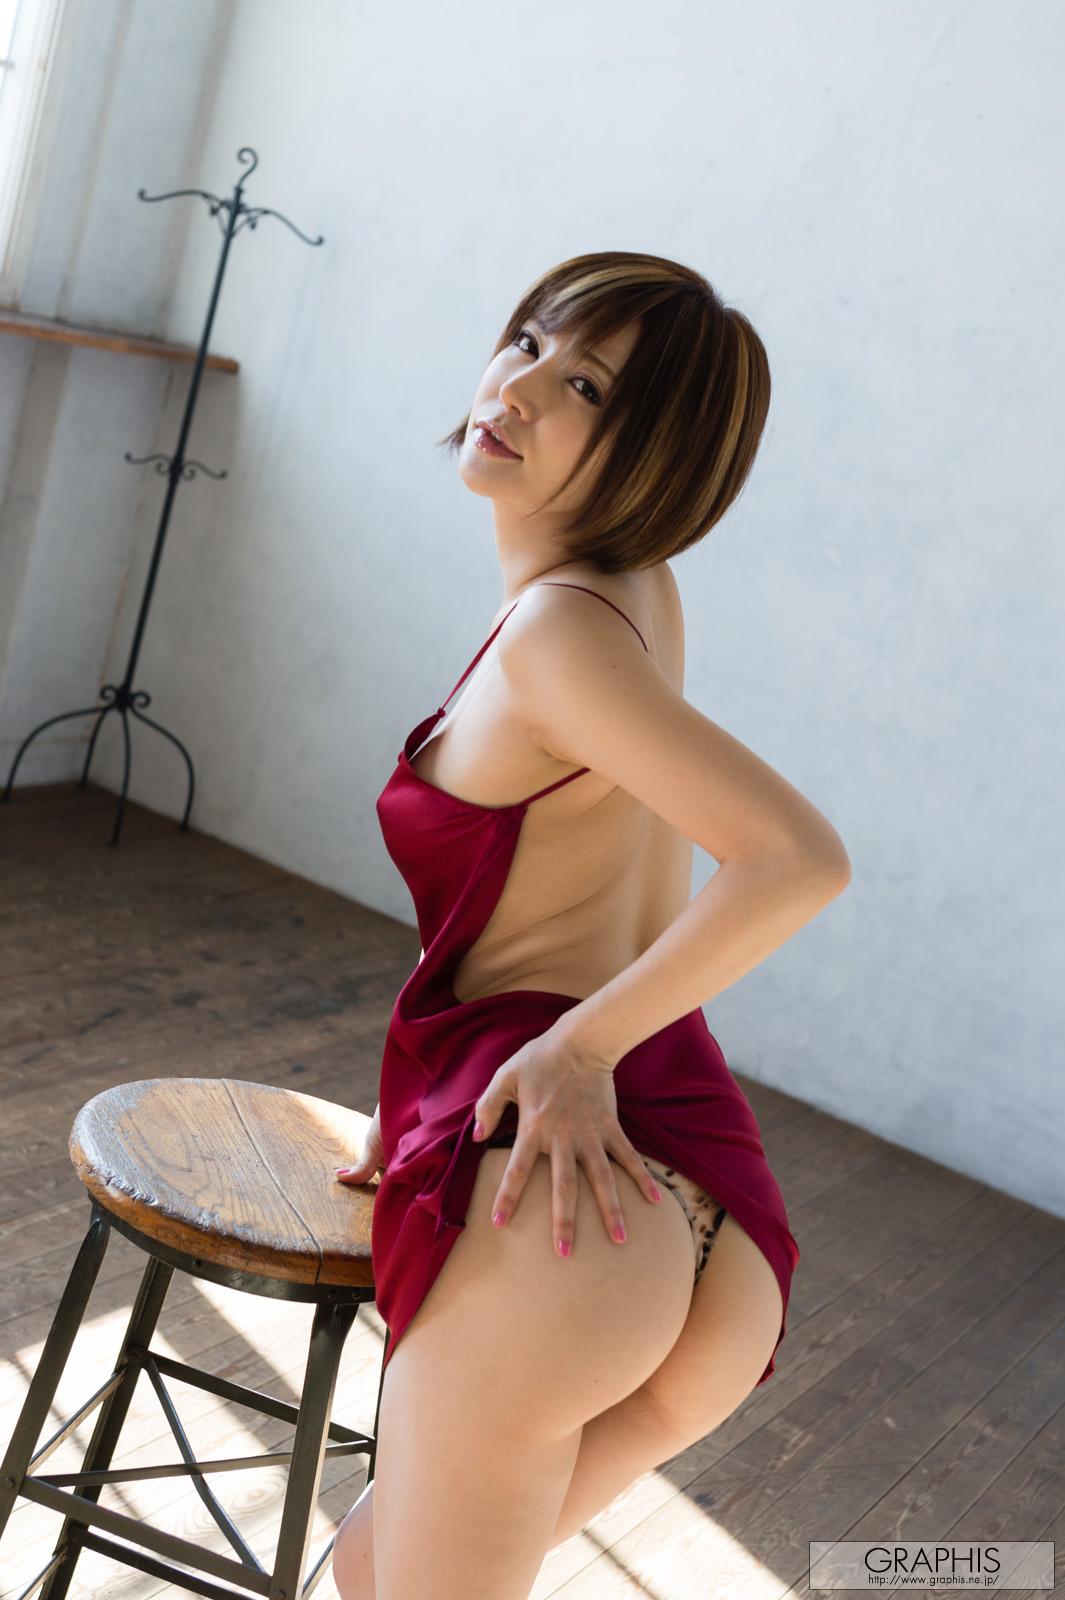 yuria-satomi-purple-nighty-nude-asian-girl-graphis-09